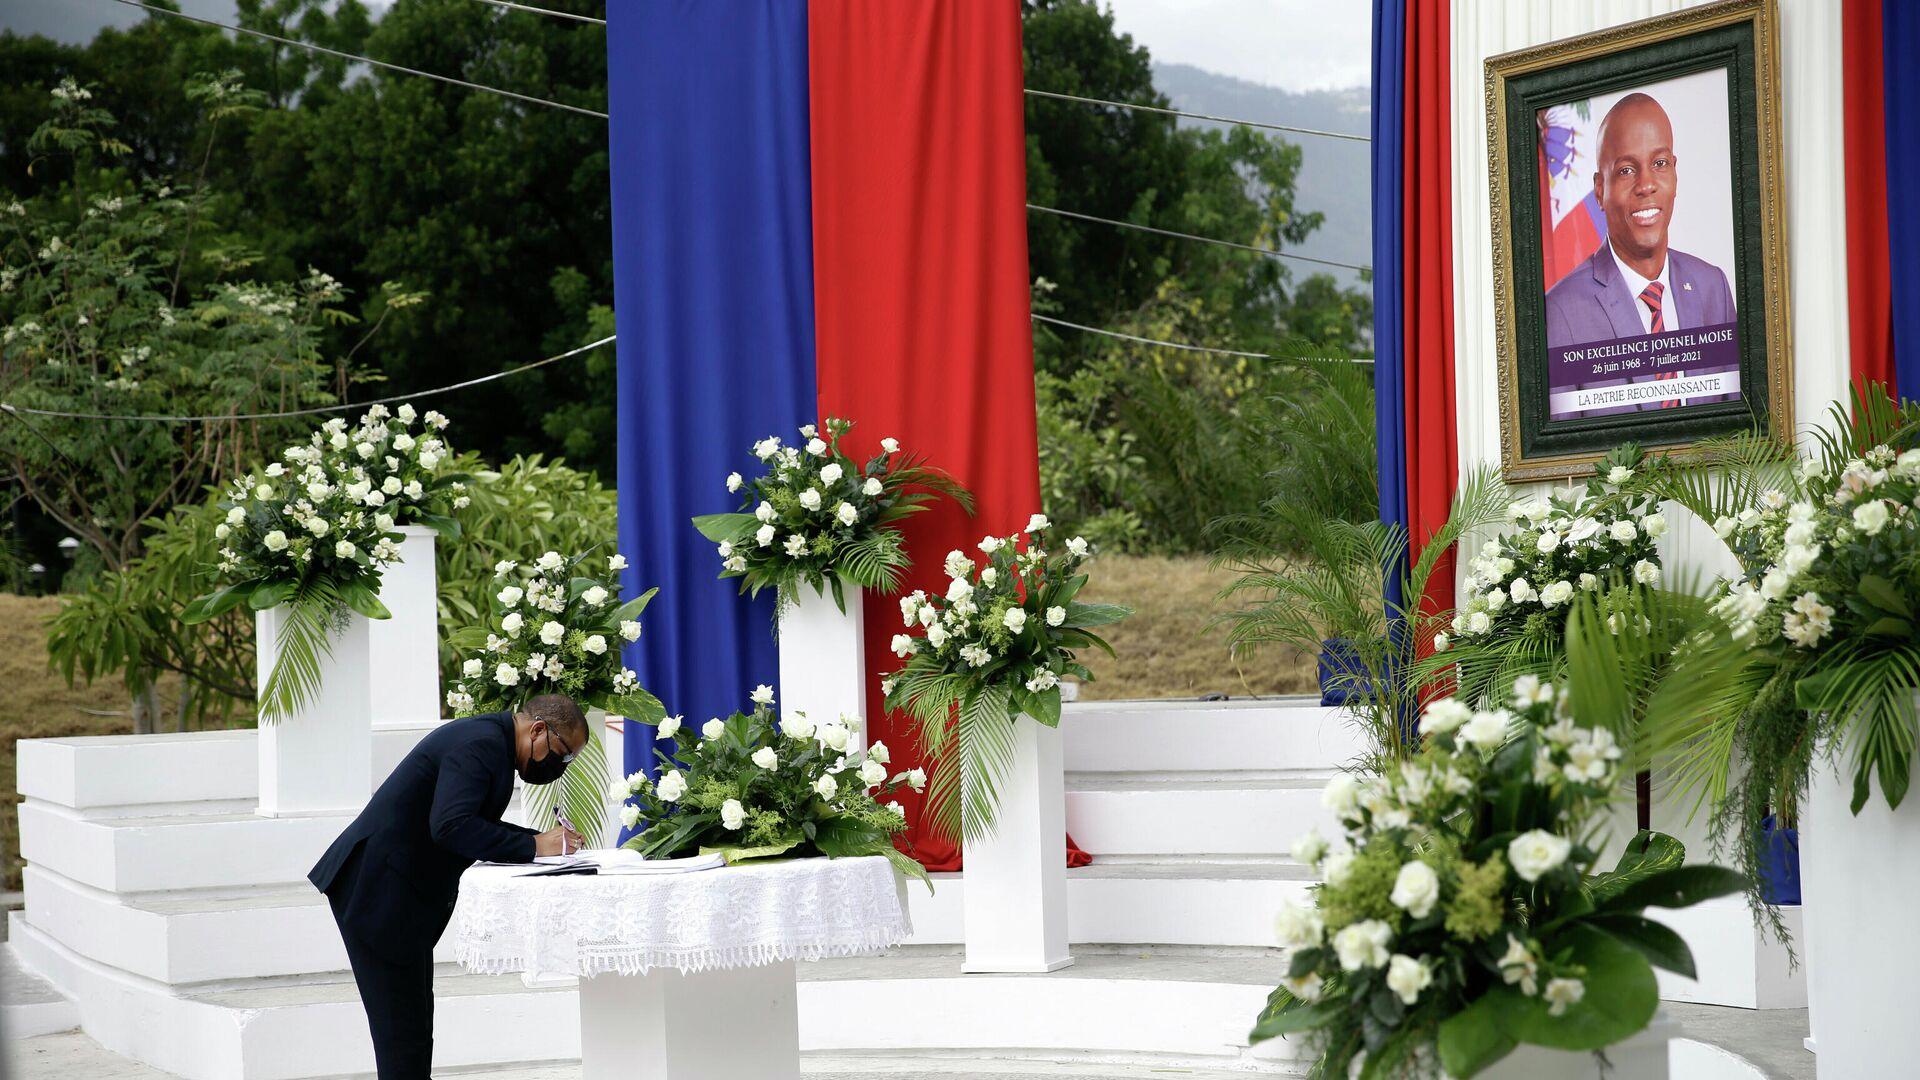 Homenaje al presidente de Haití, Jovenel Moise - Sputnik Mundo, 1920, 20.07.2021